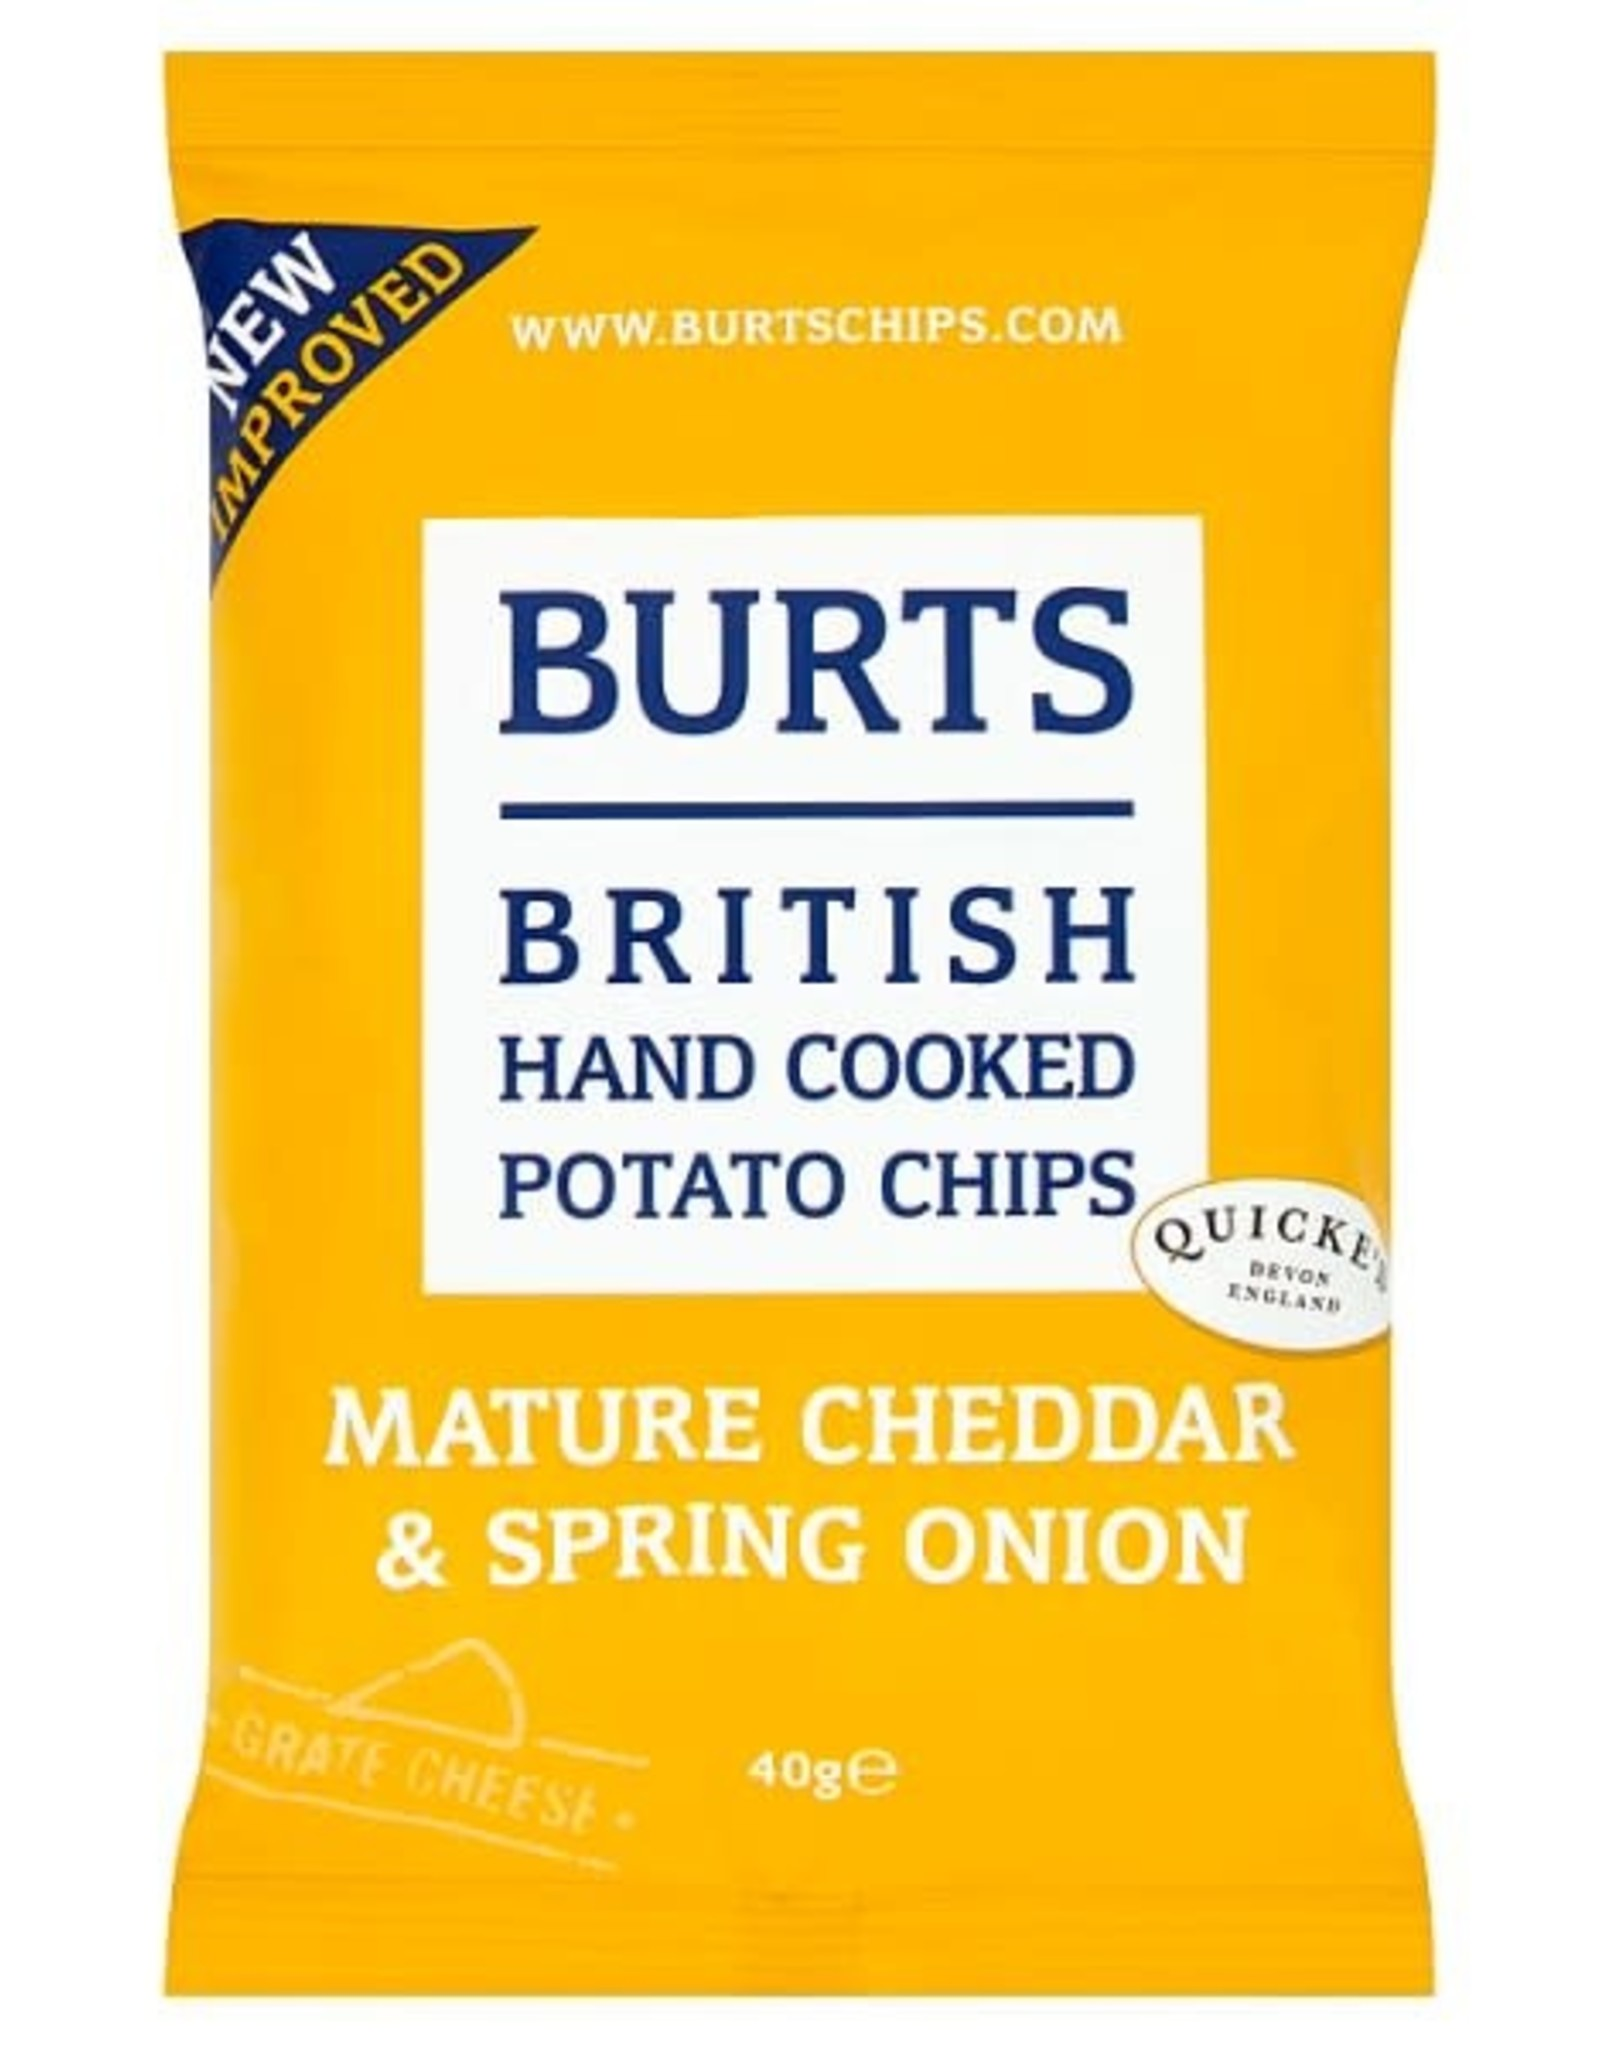 Burts Burts Matture Cheddar & Spring Onion 150 g